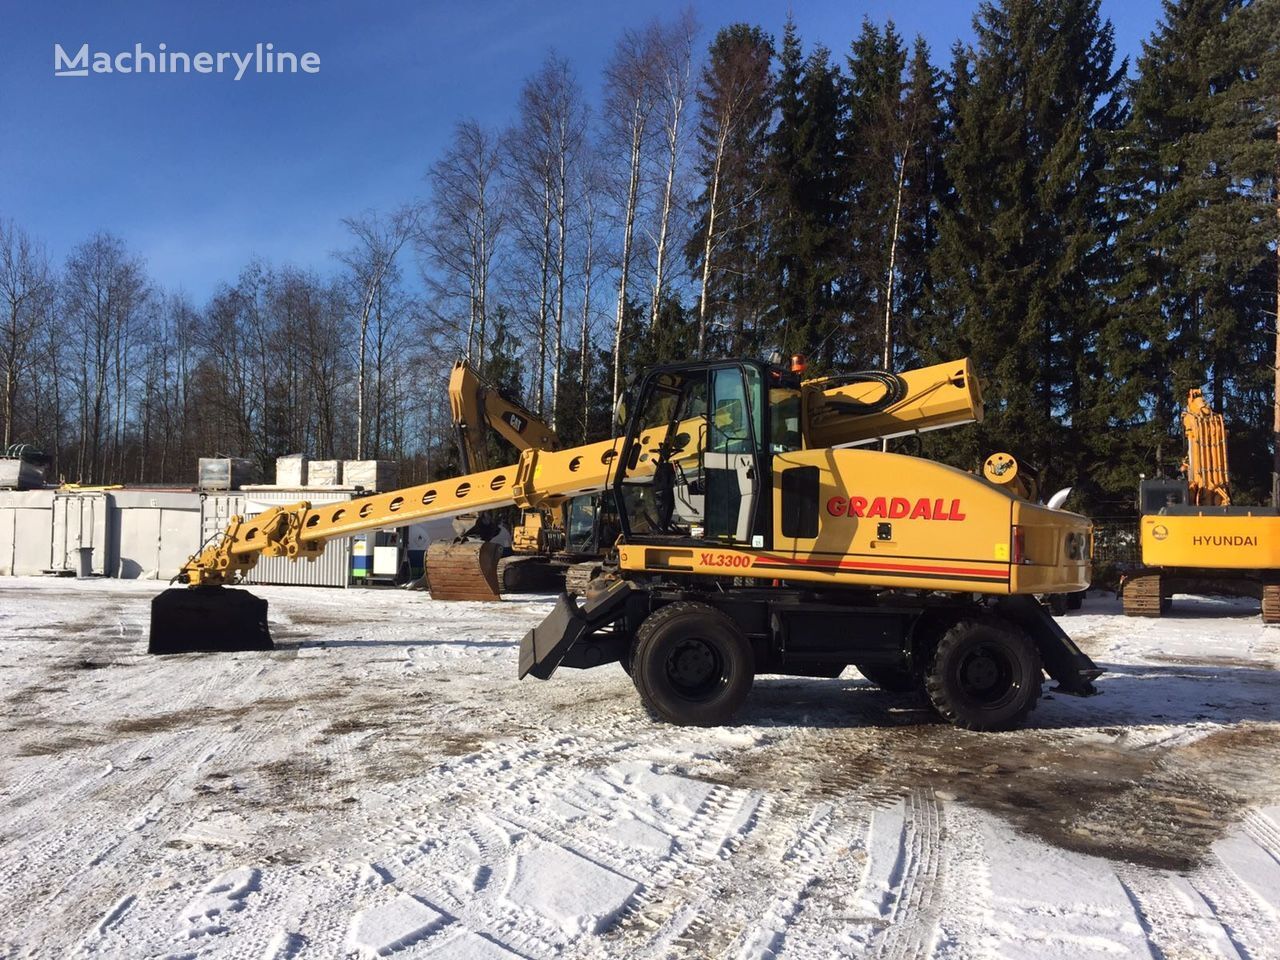 GRADALL XL 3300 escavadora de rodas